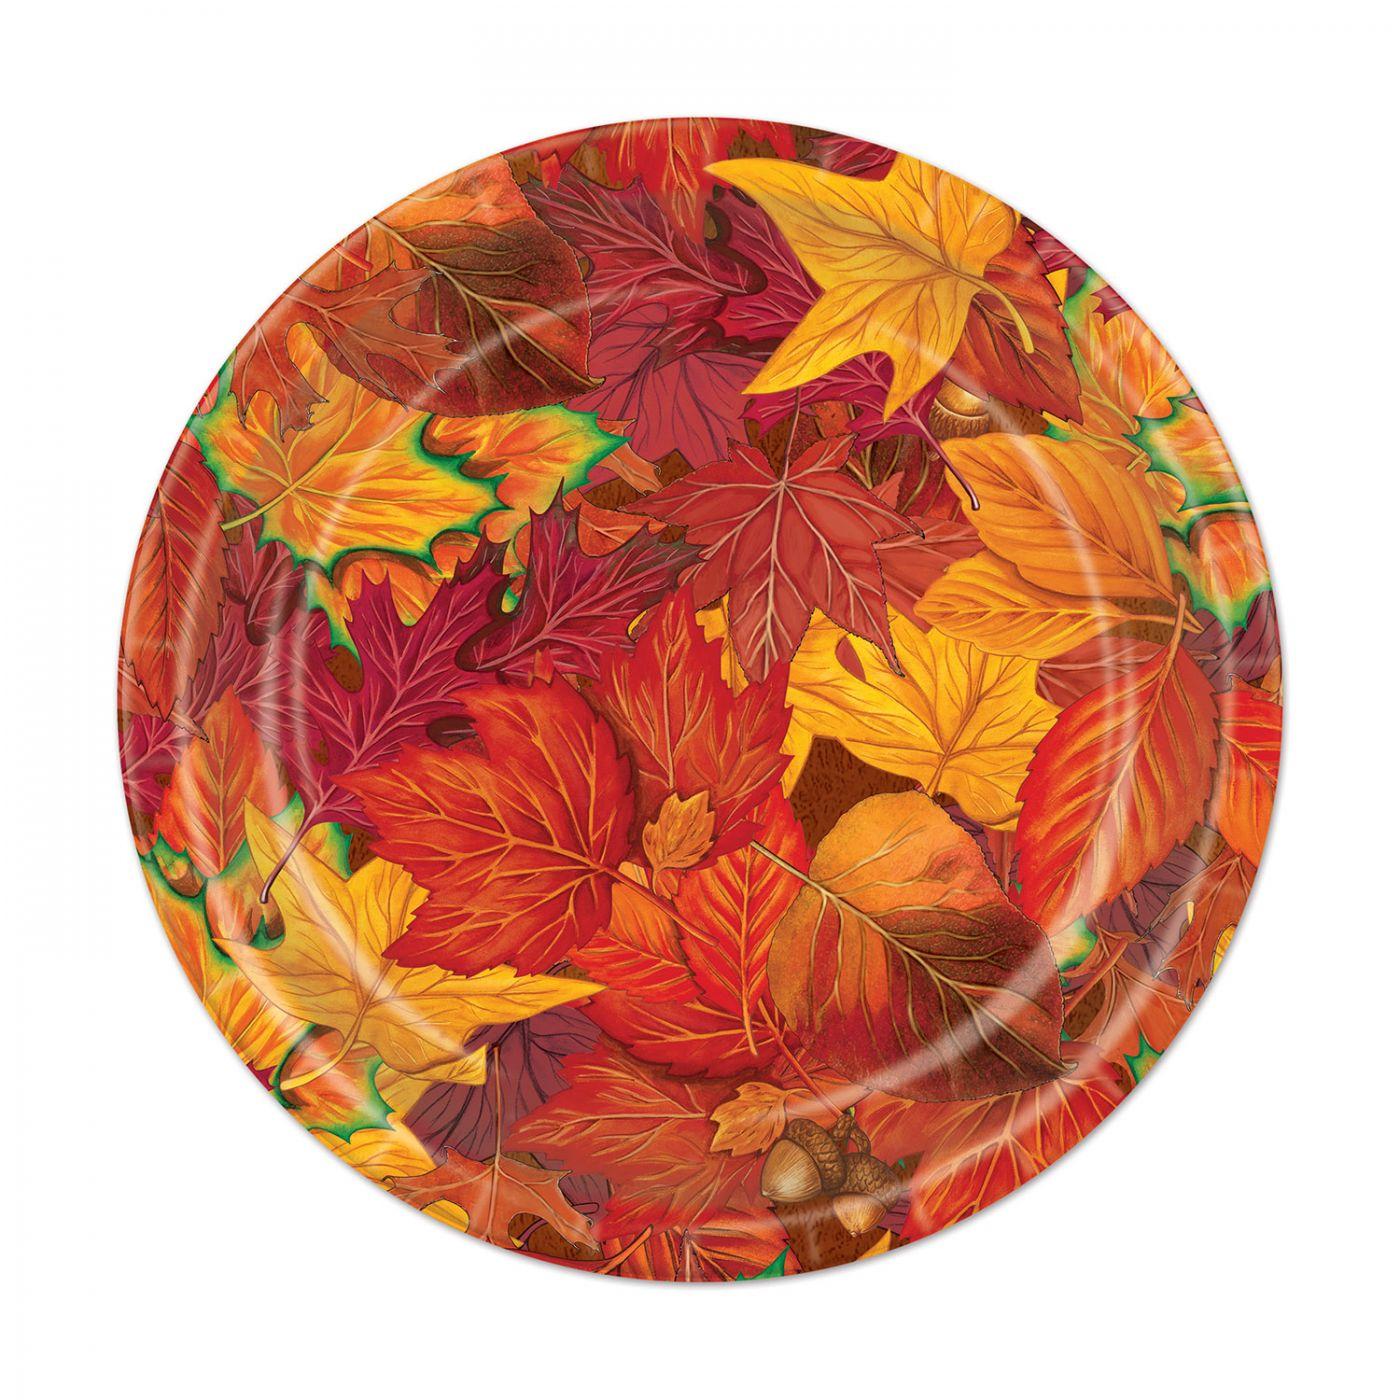 Fall Leaf Plates image